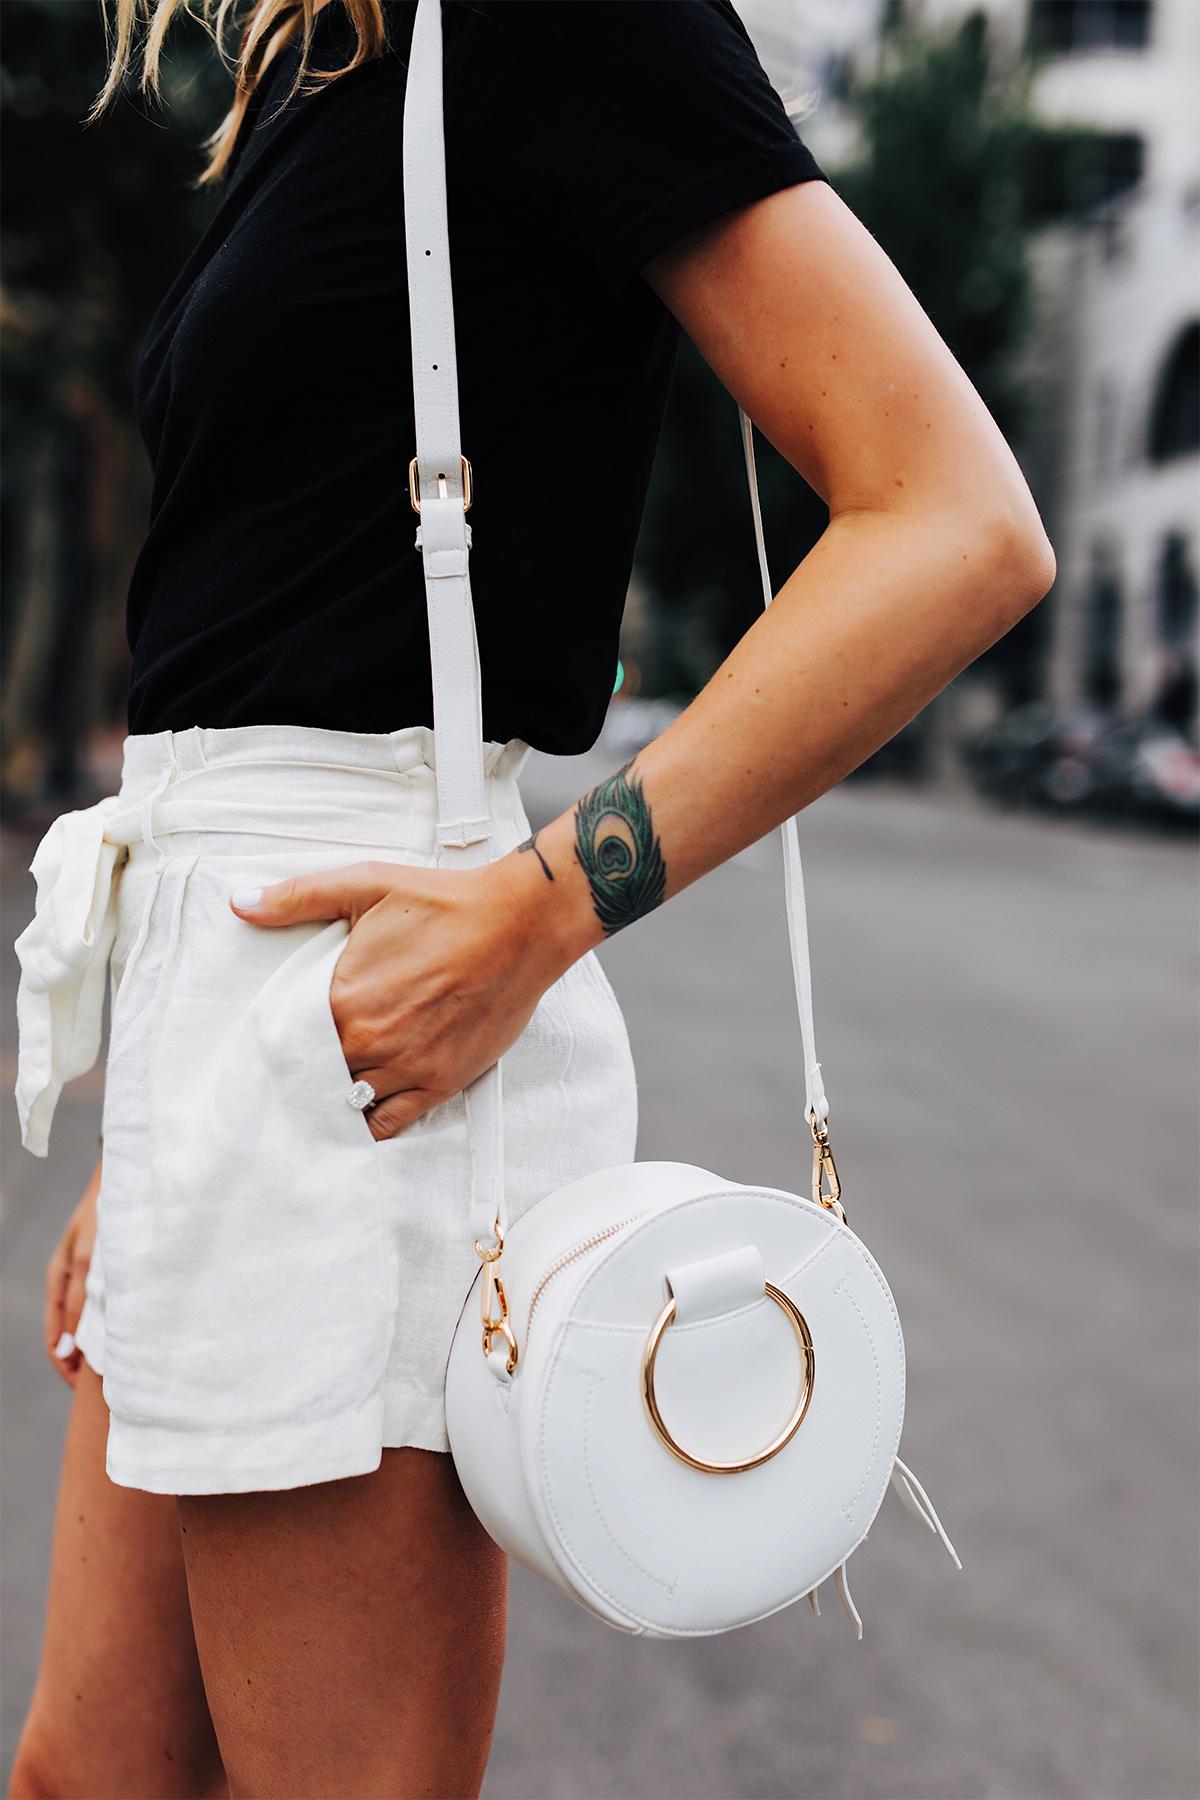 Fashion Jackson Wearing Black Tshirt White Tie Front Shorts White Circle Handbag